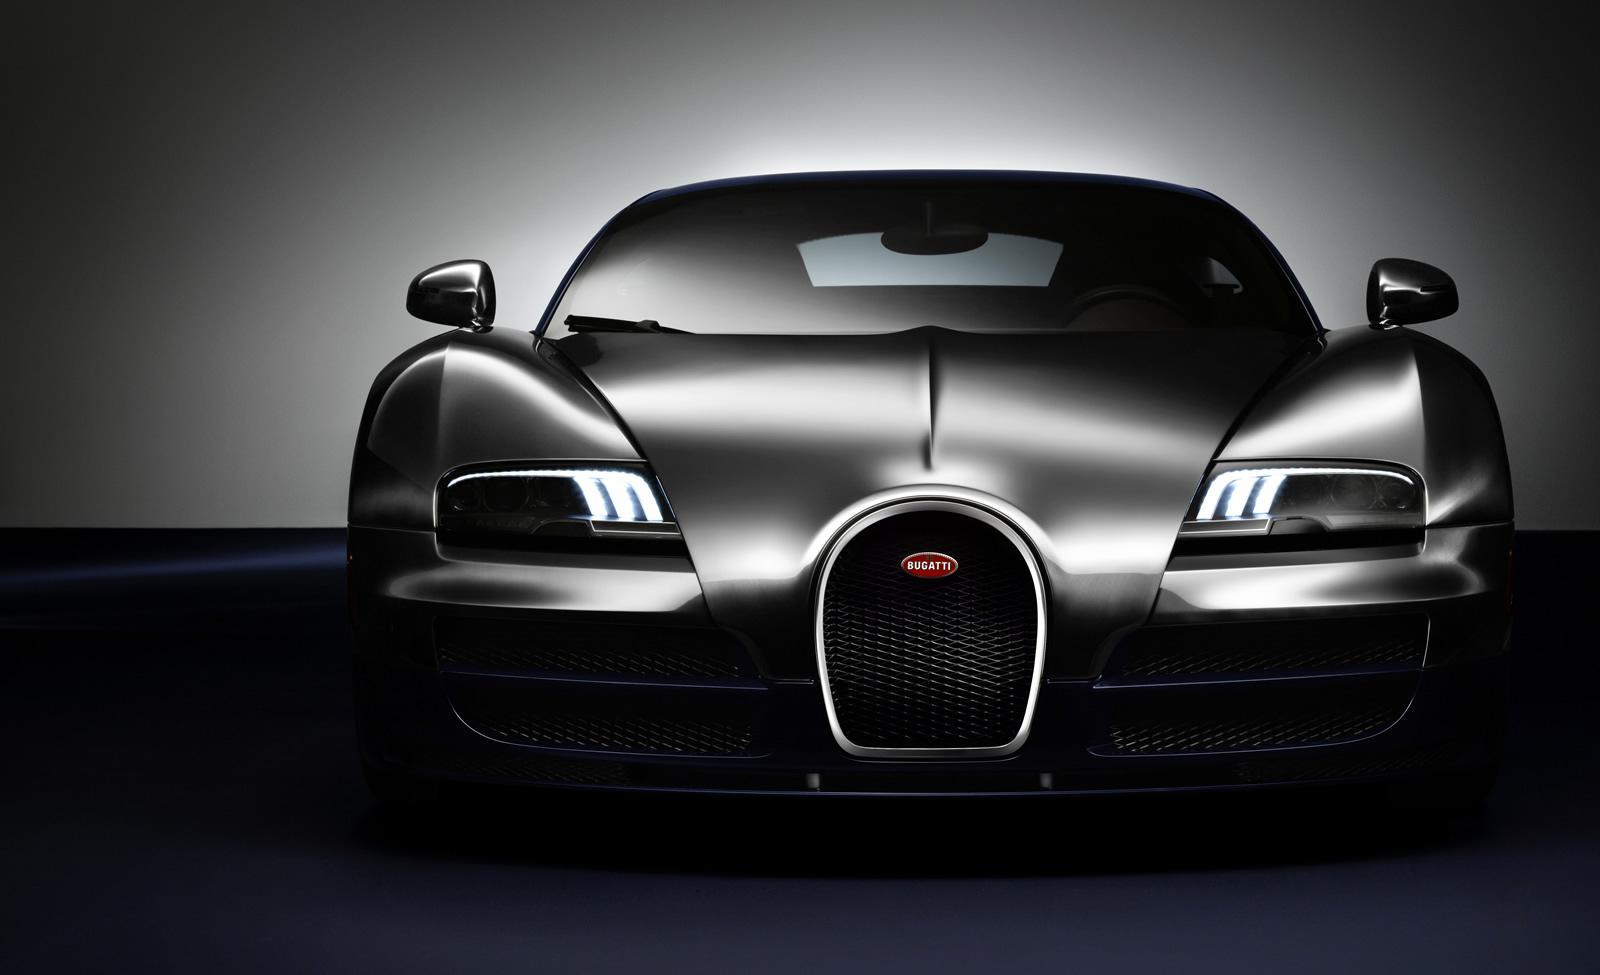 bugatti veyron ettore bugatti unveiled as the final legend edition. Black Bedroom Furniture Sets. Home Design Ideas